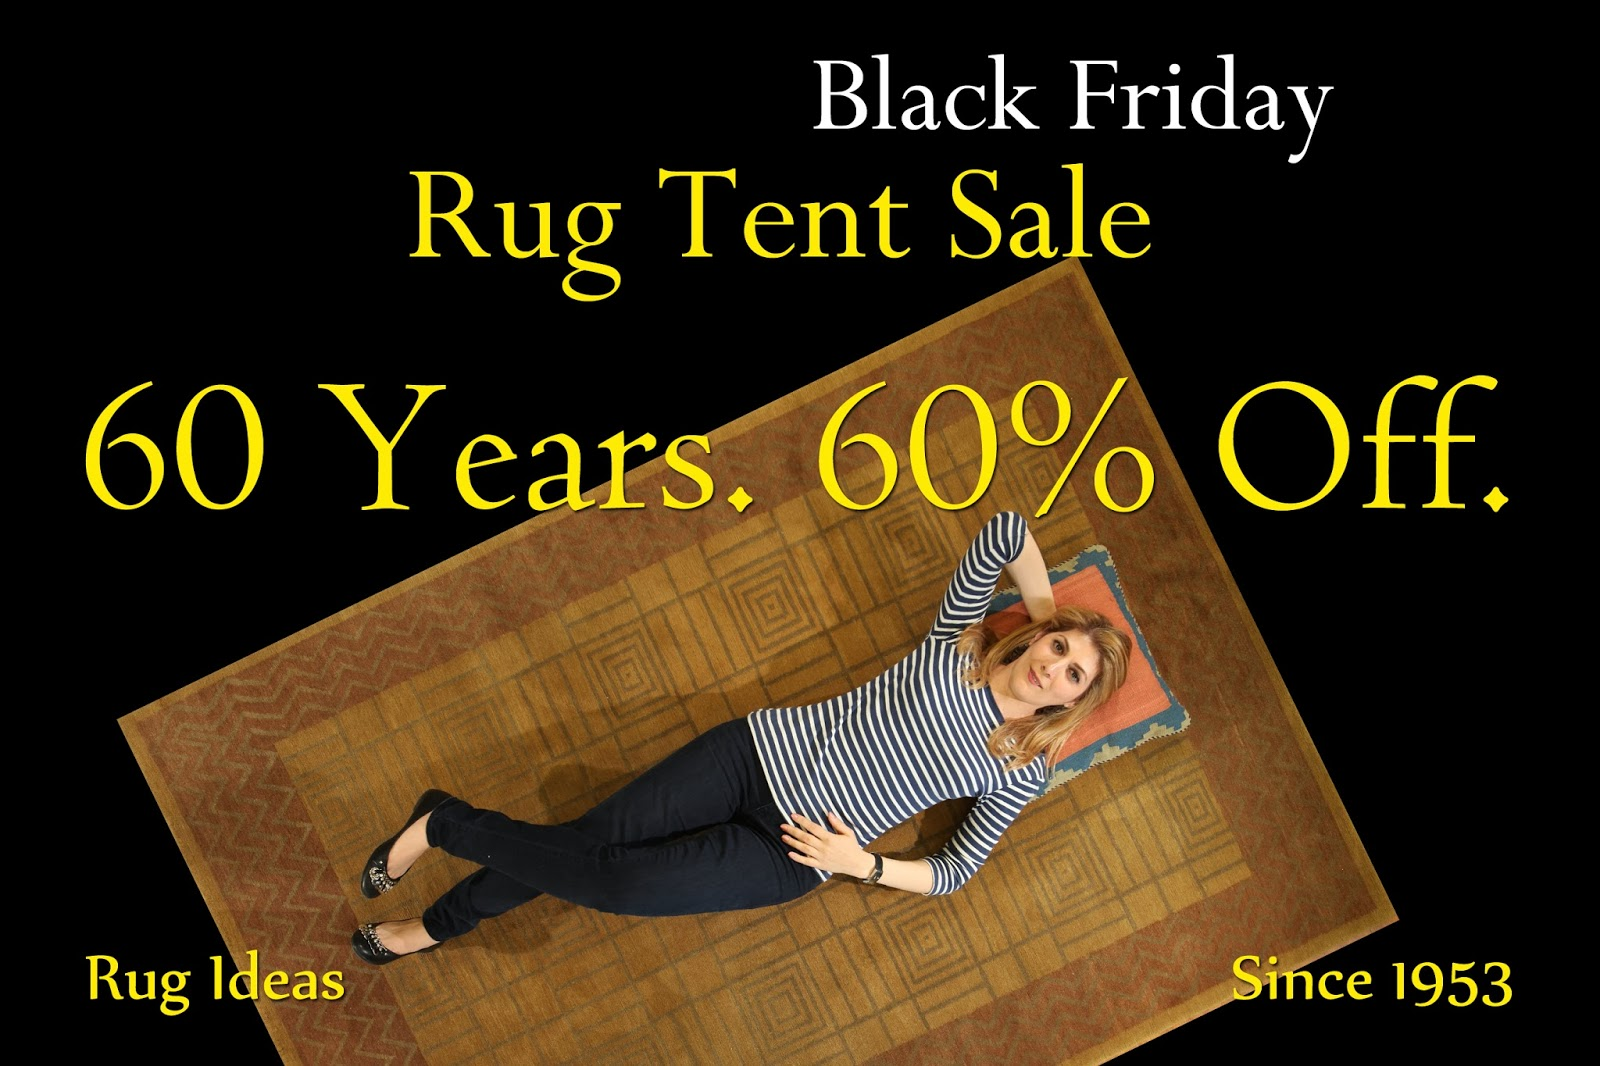 rug master rug tent sale in los angeles 60 off on black friday and saturday nov 29th and nov. Black Bedroom Furniture Sets. Home Design Ideas